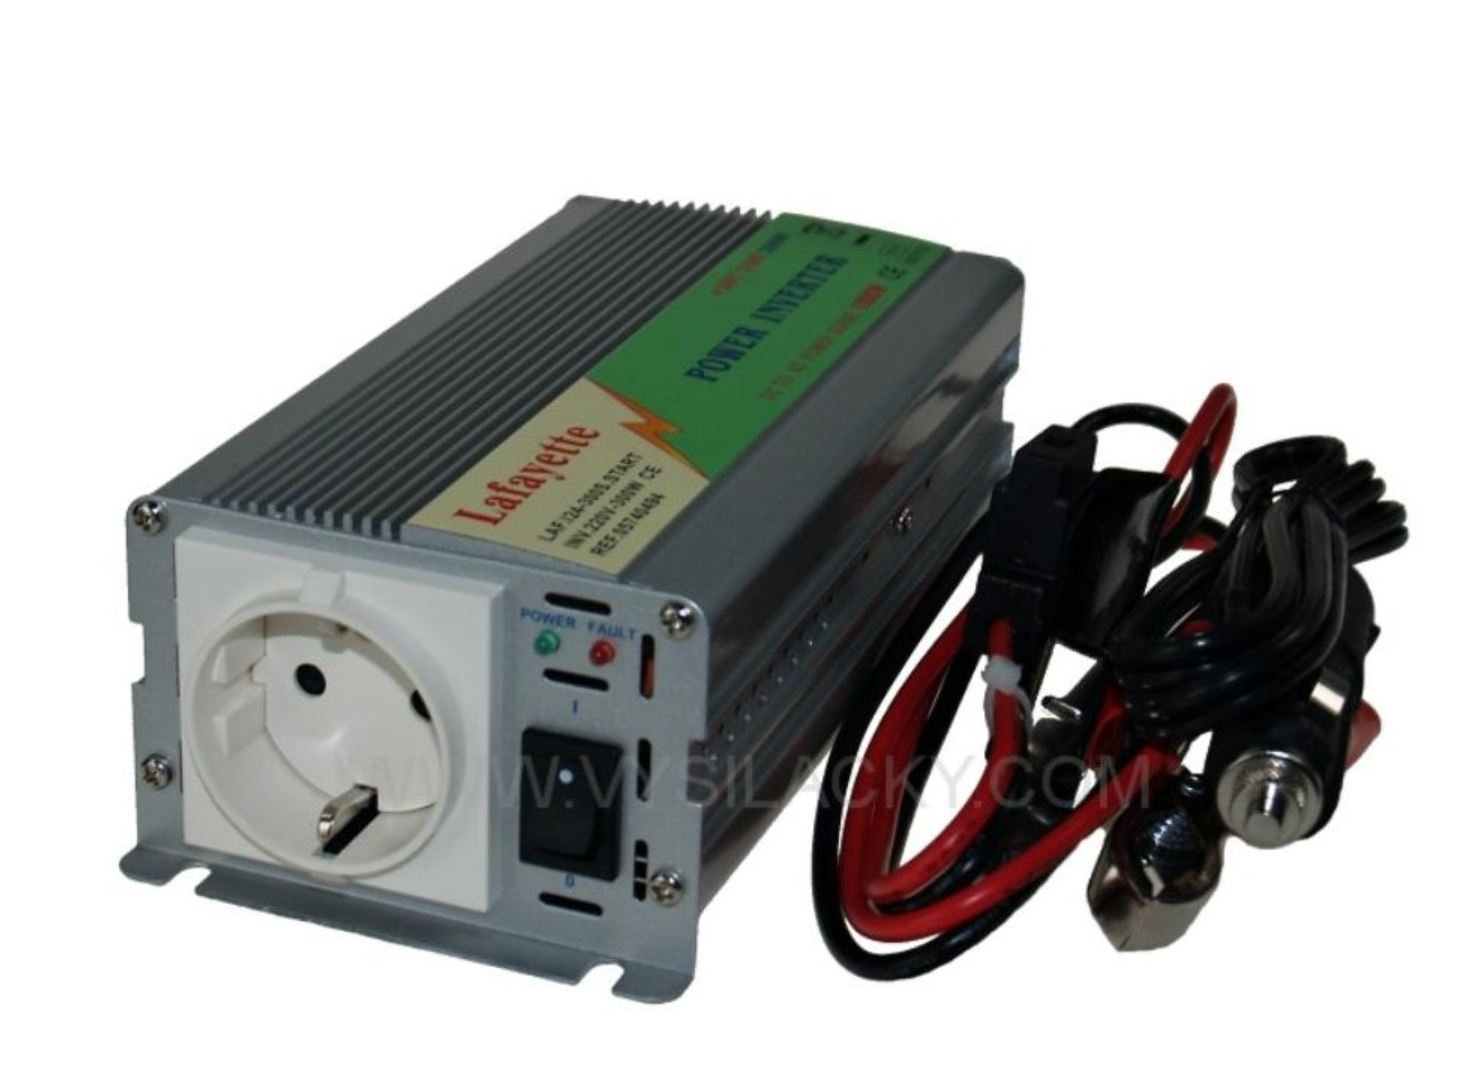 OEM Měnič 24V/230V 300W (600W)